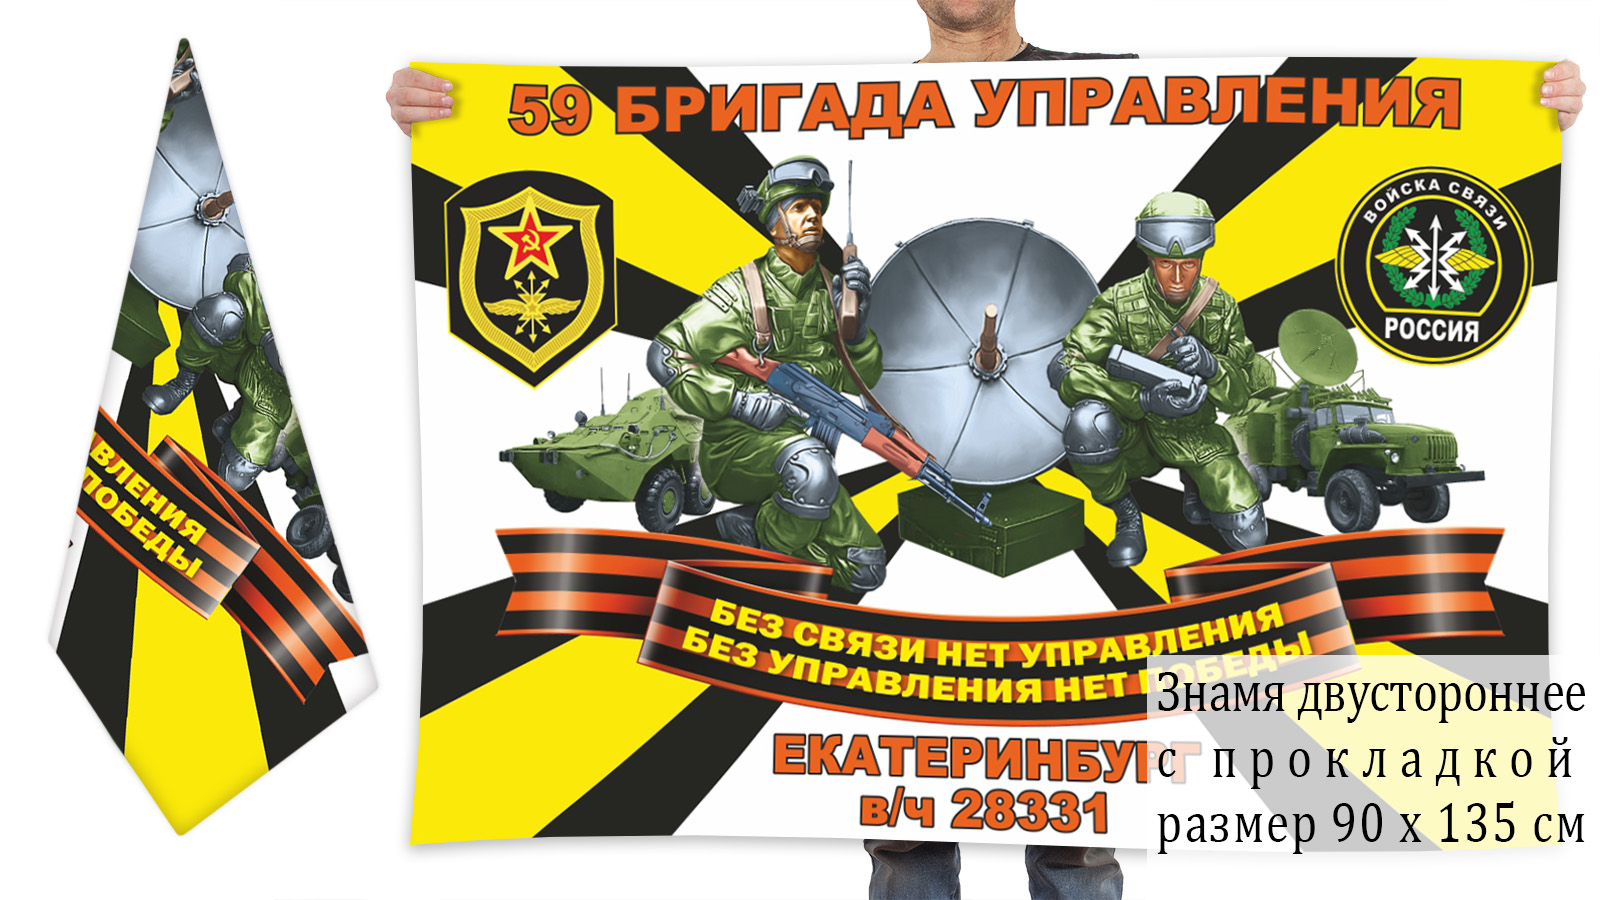 Двусторонний флаг 59 бригада управления войск связи